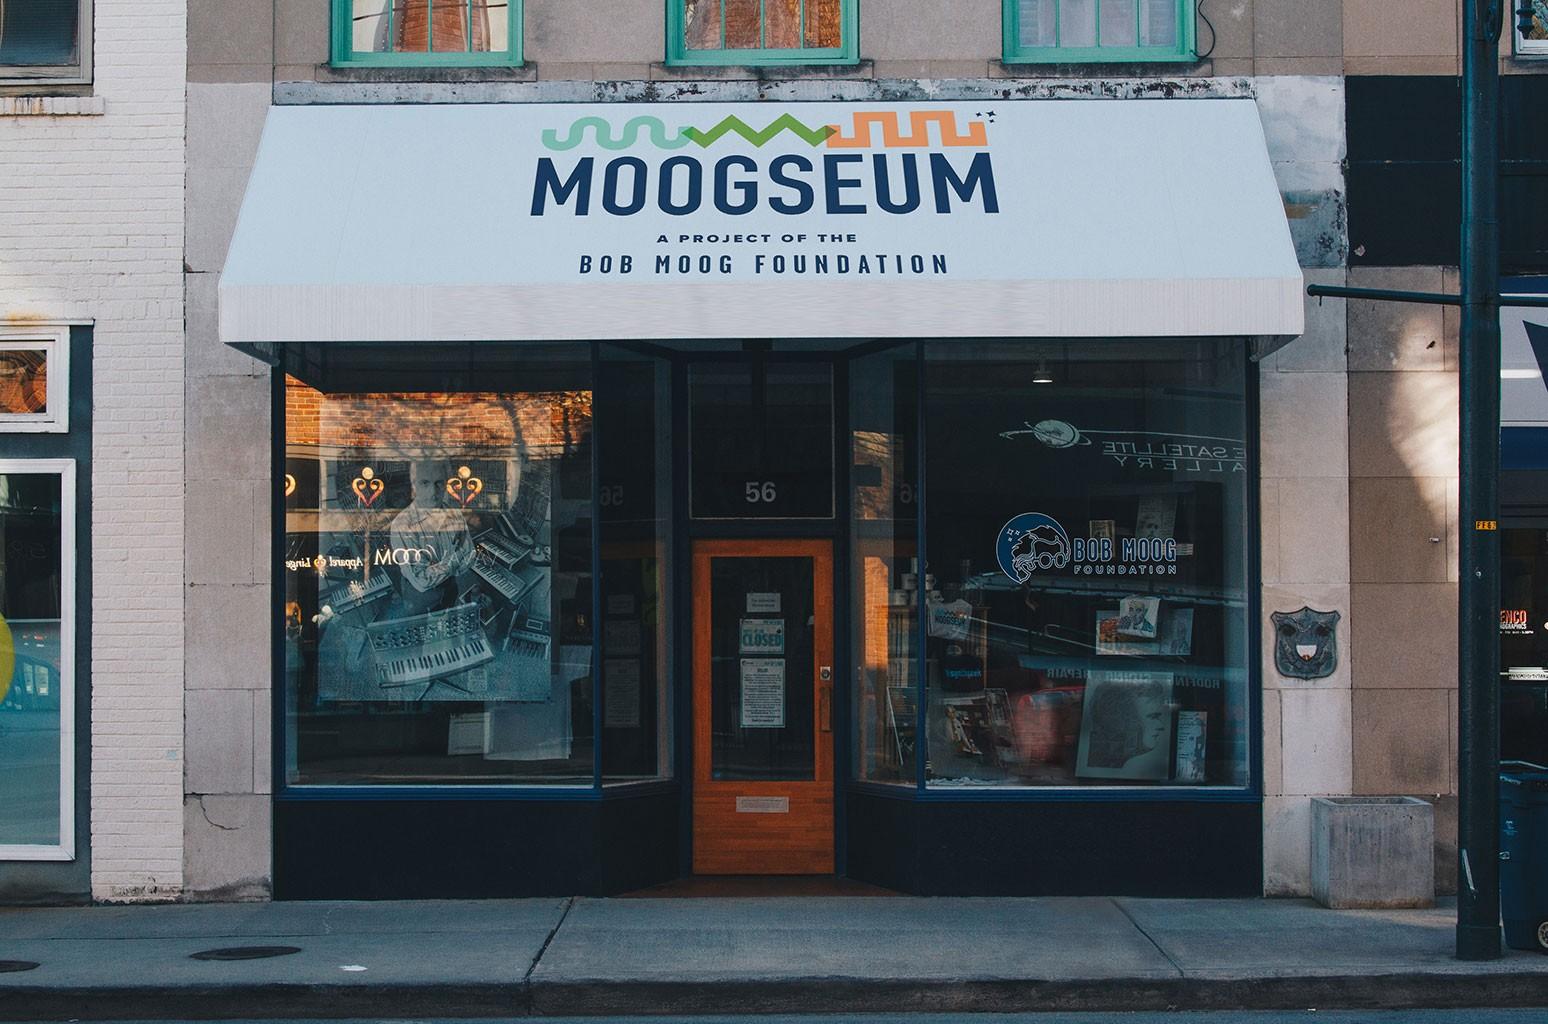 The Moogseum